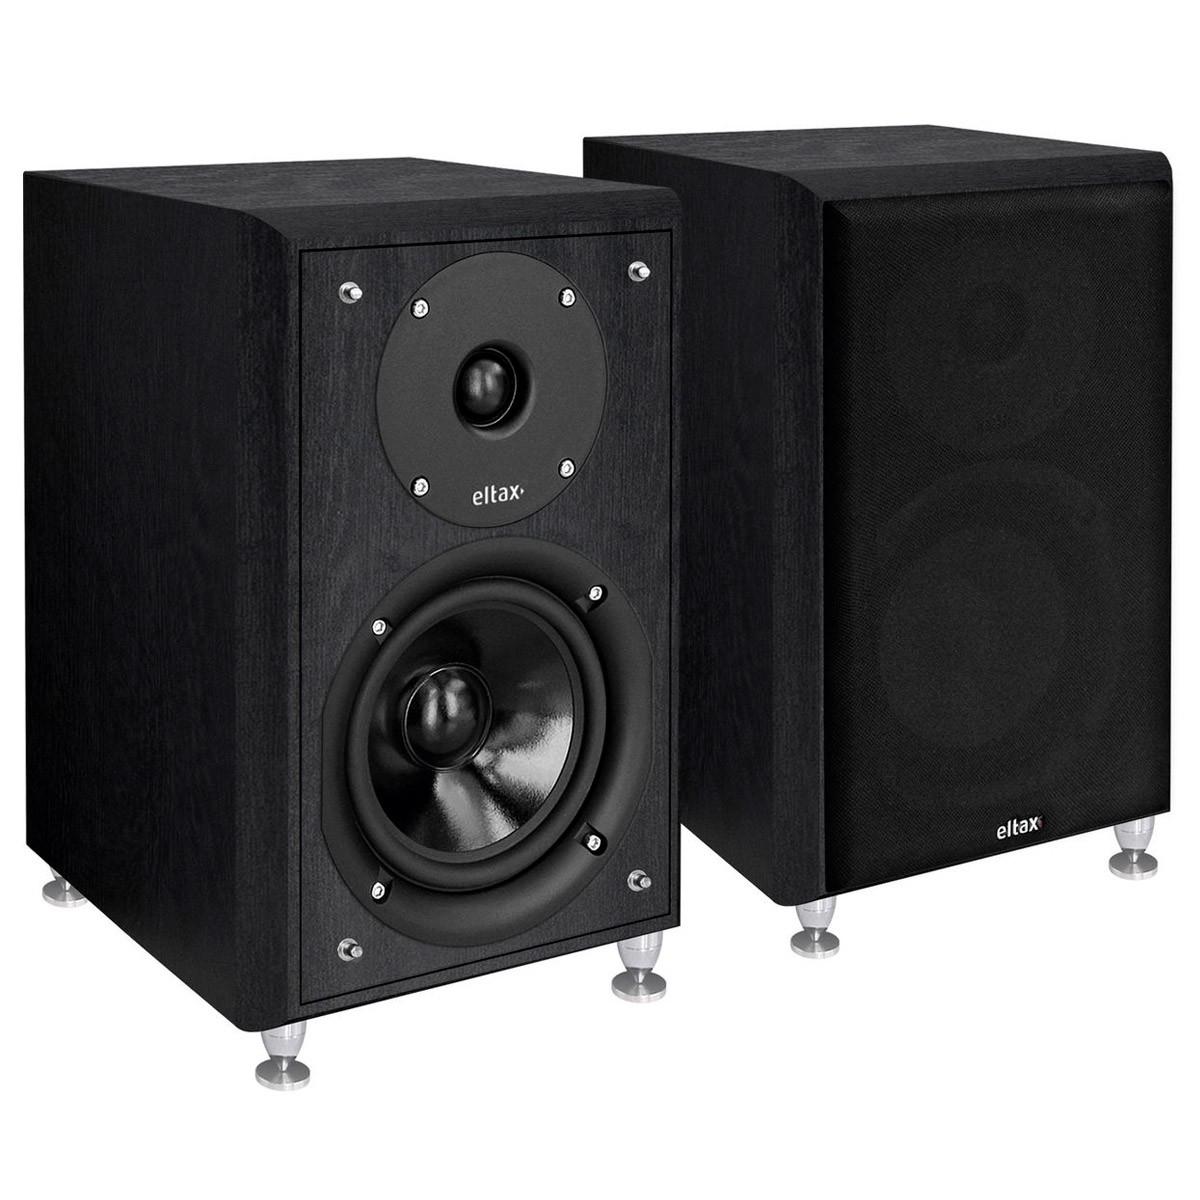 ELTAX MONITOR III Bookshelf Speaker 2 Ways 90W 89db 50Hz-22kHz Black (Pair)